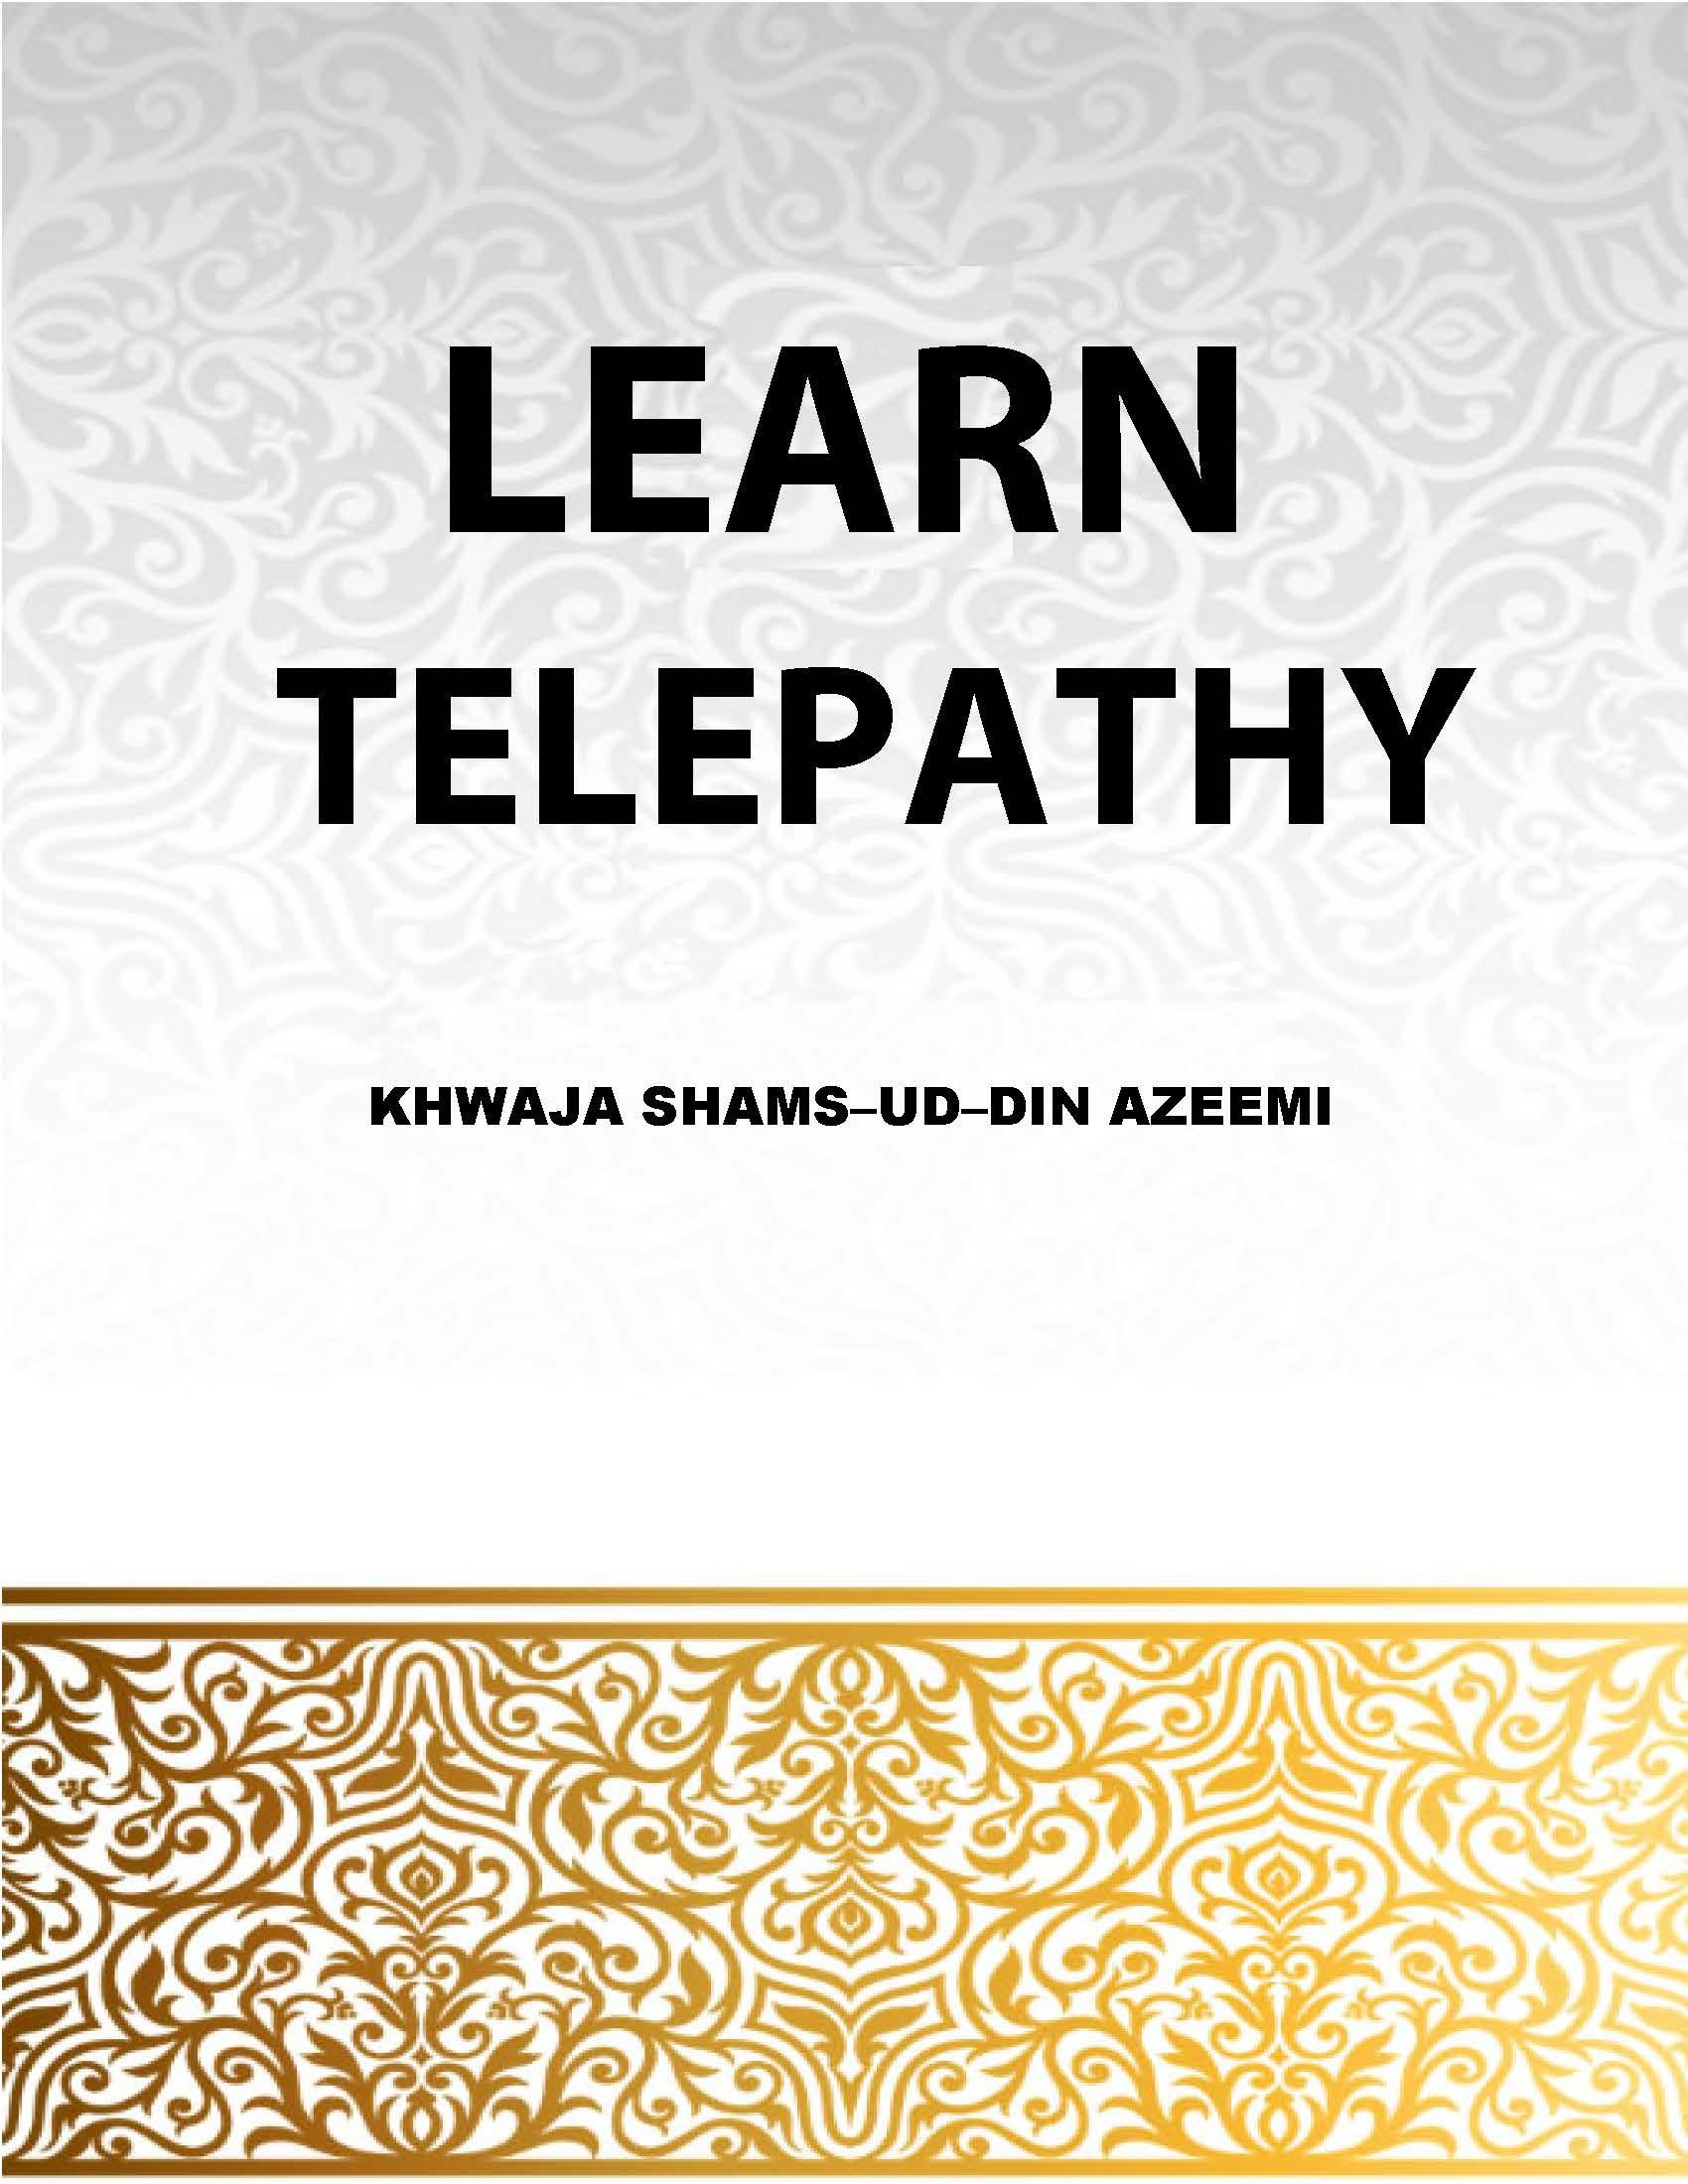 Learn Telepathy